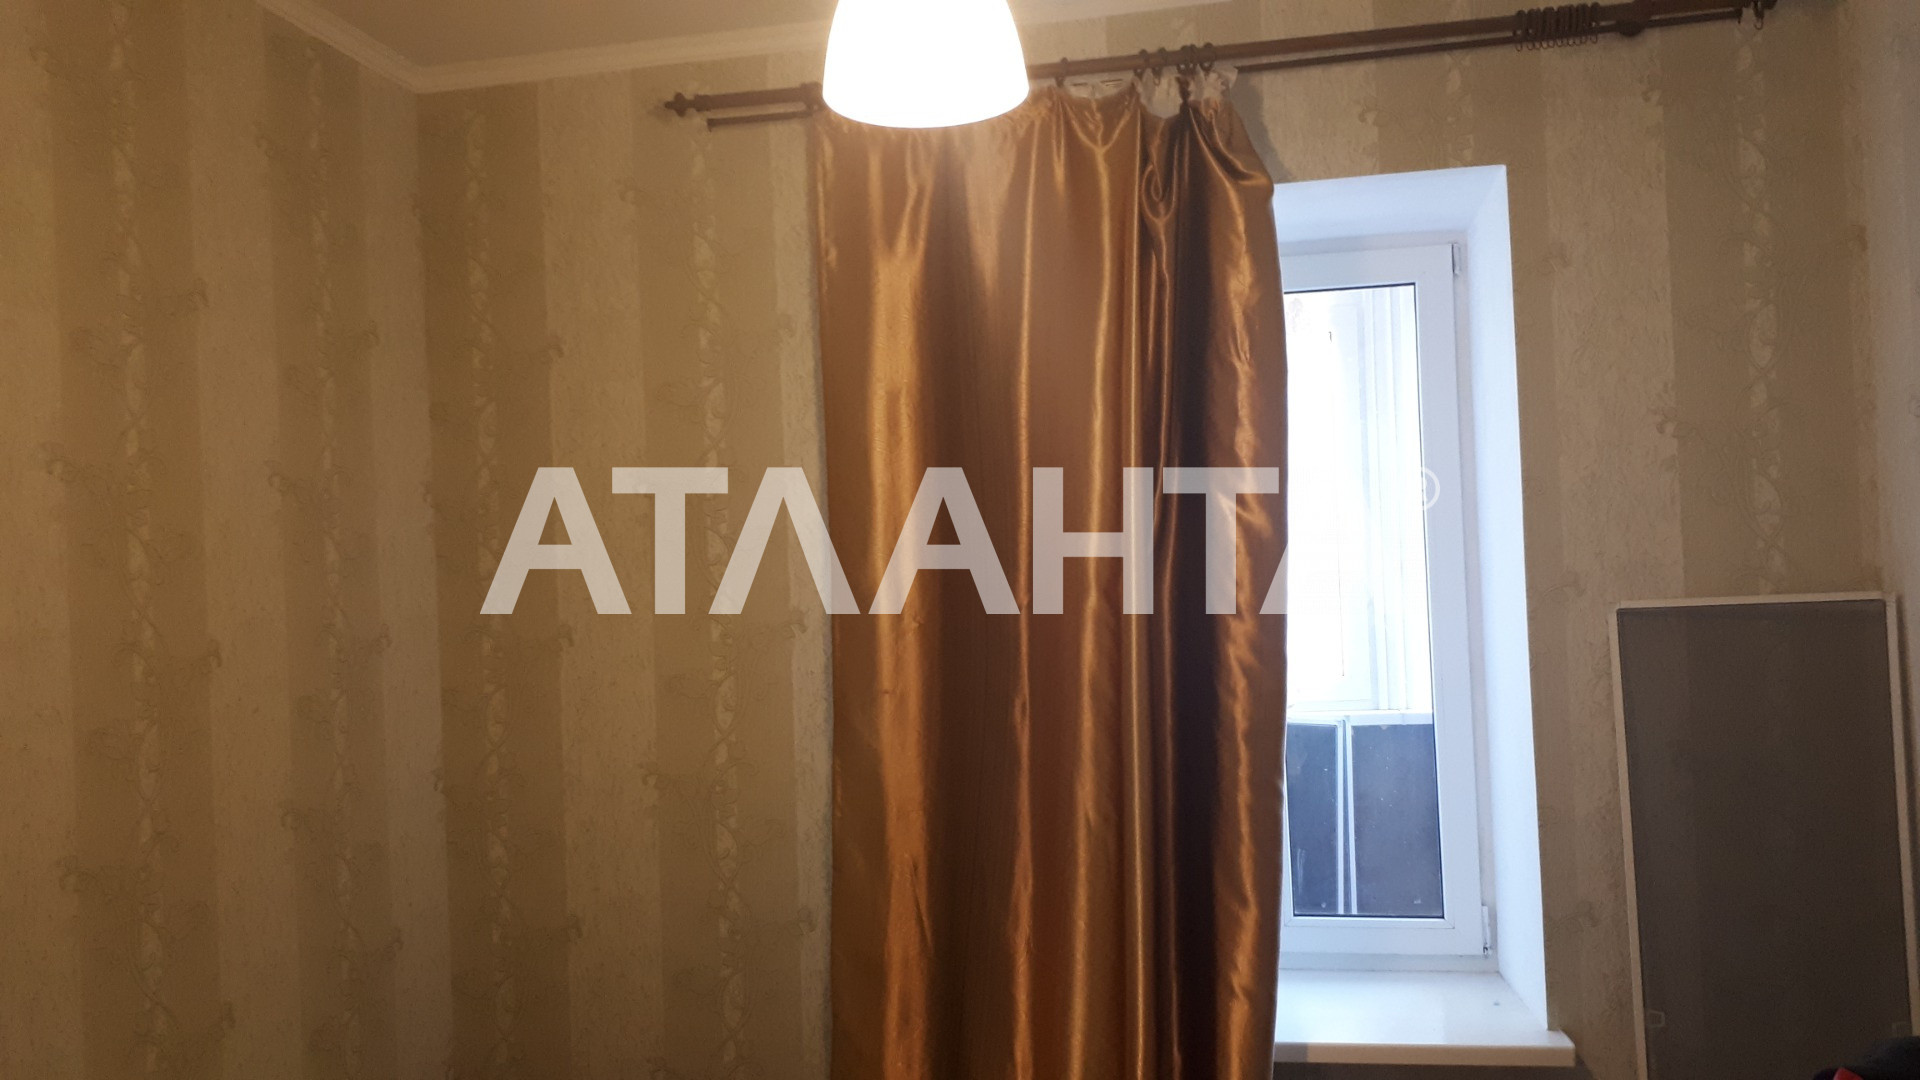 Продается 2-комнатная Квартира на ул. Хантадзе Пер. — 63 000 у.е. (фото №11)